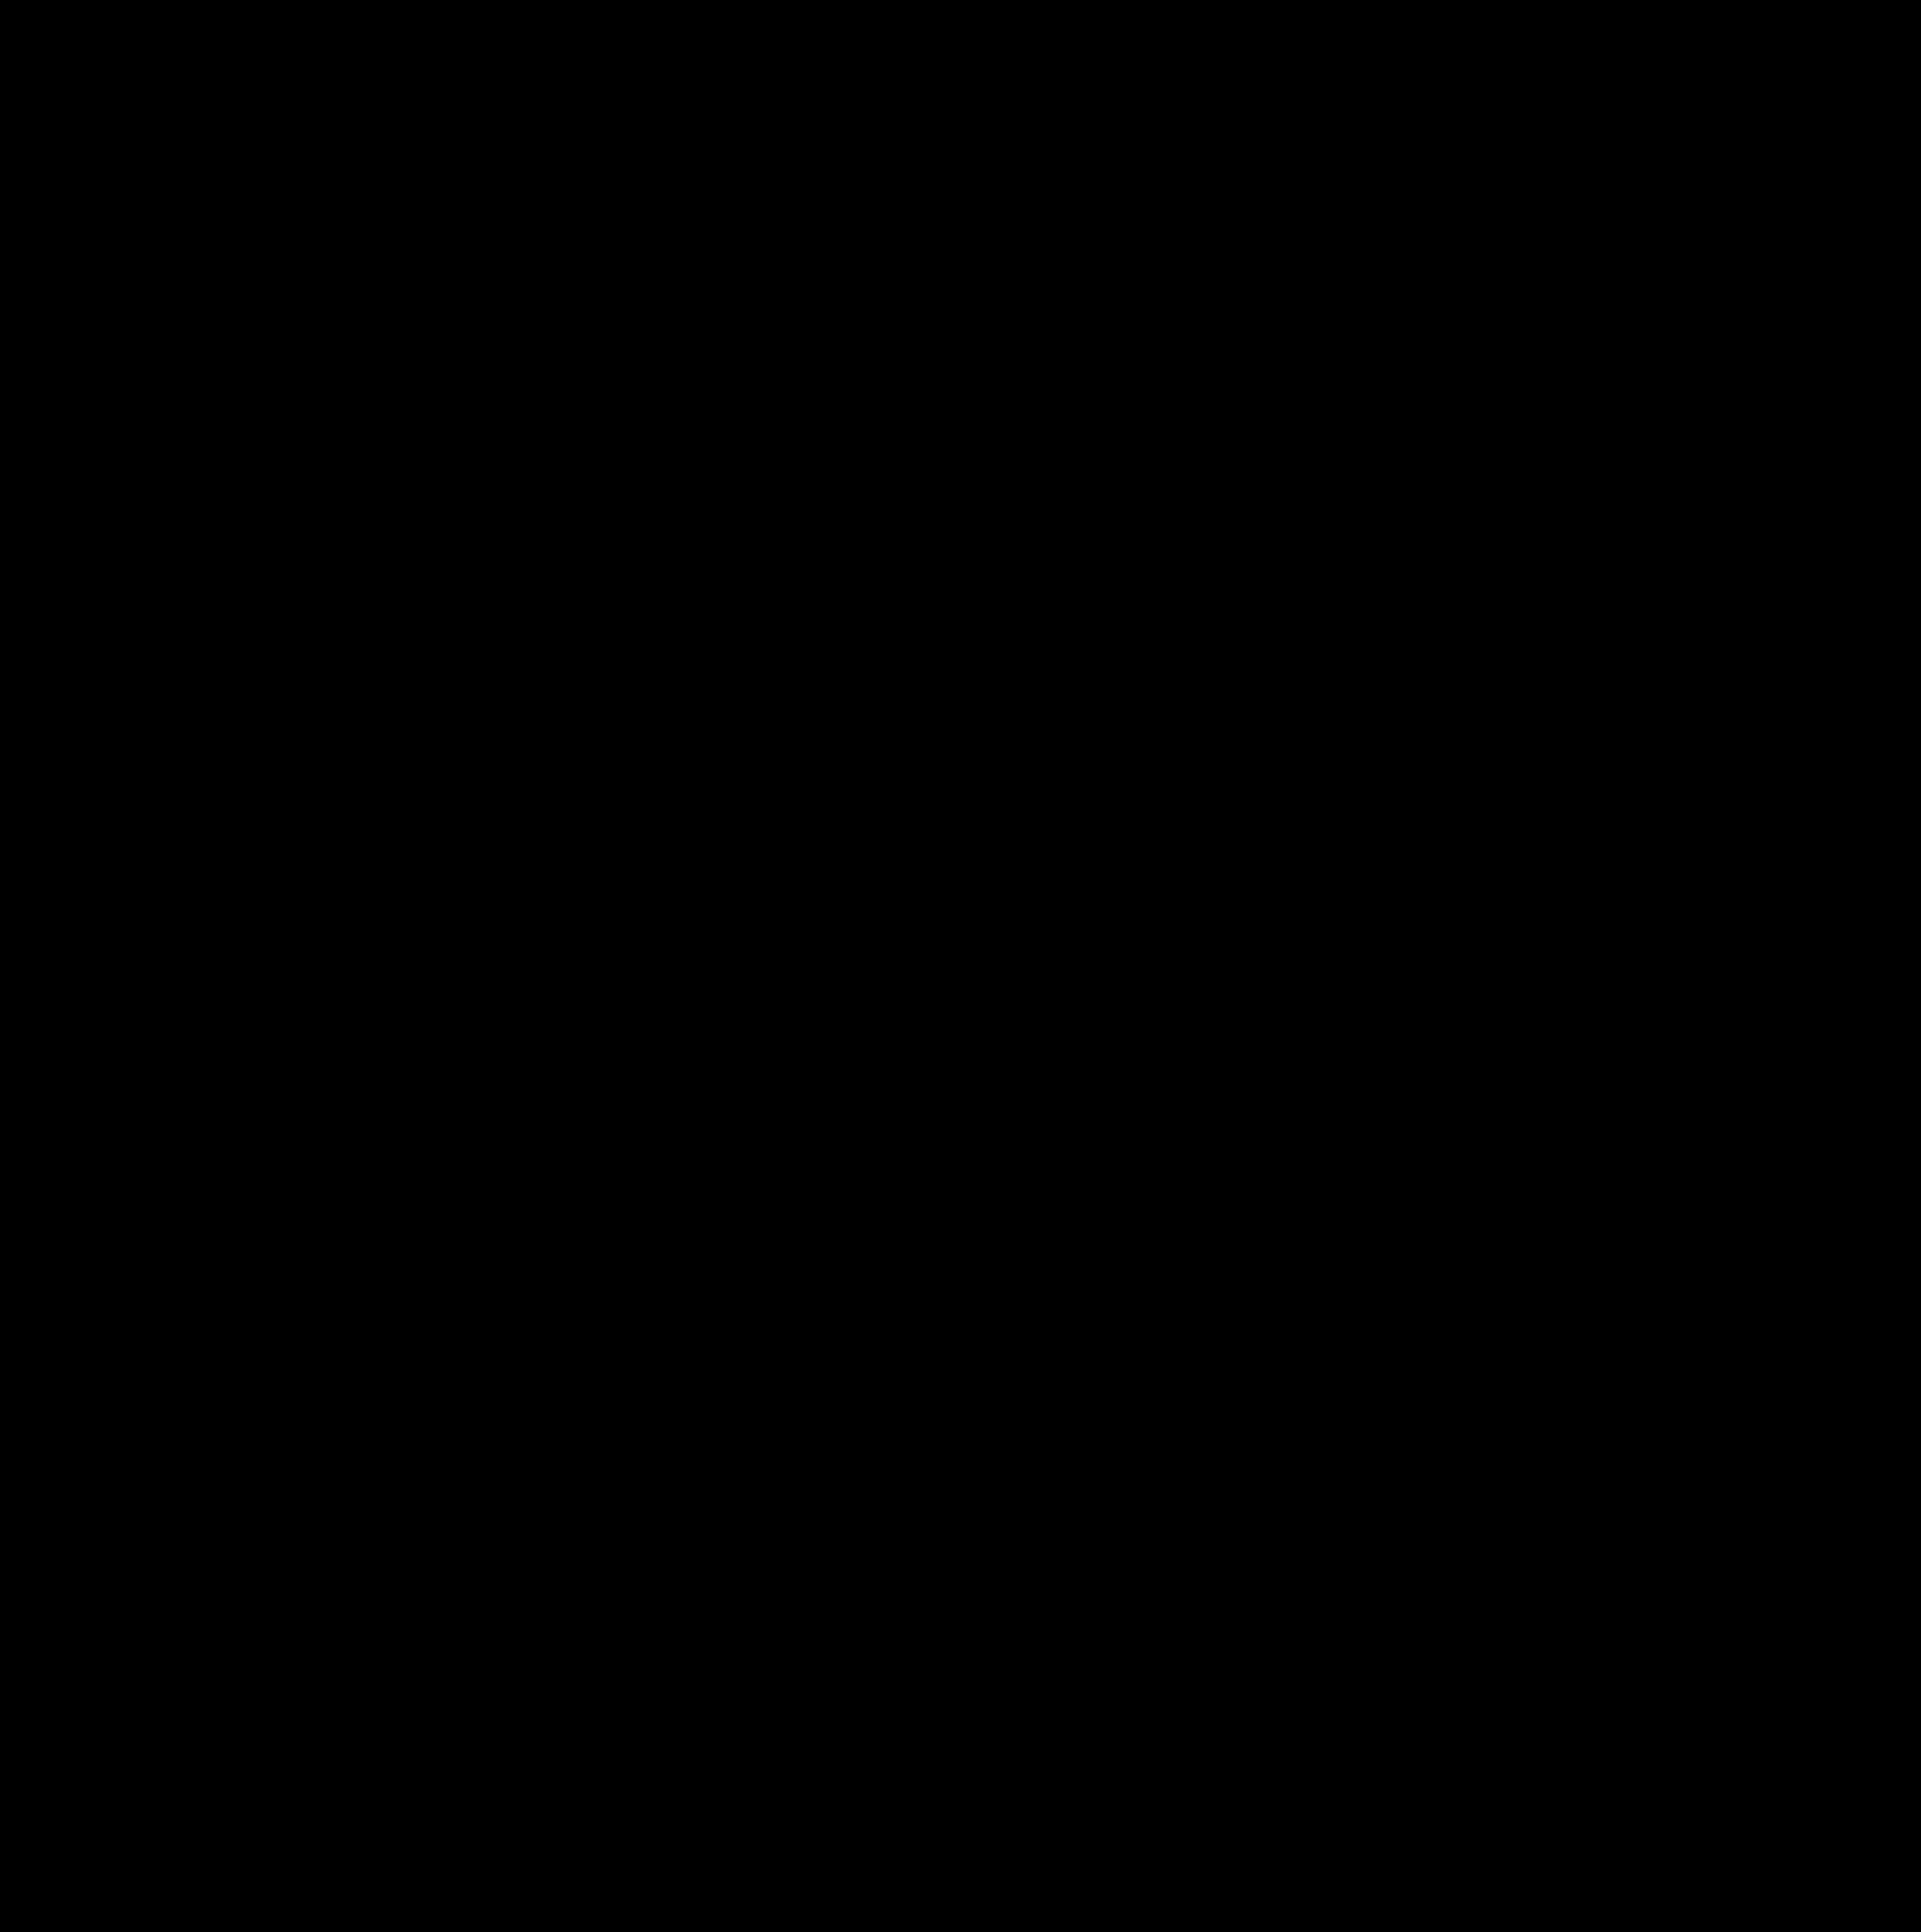 Black rose (symbolism) Wikipedia, the free encyclopedia